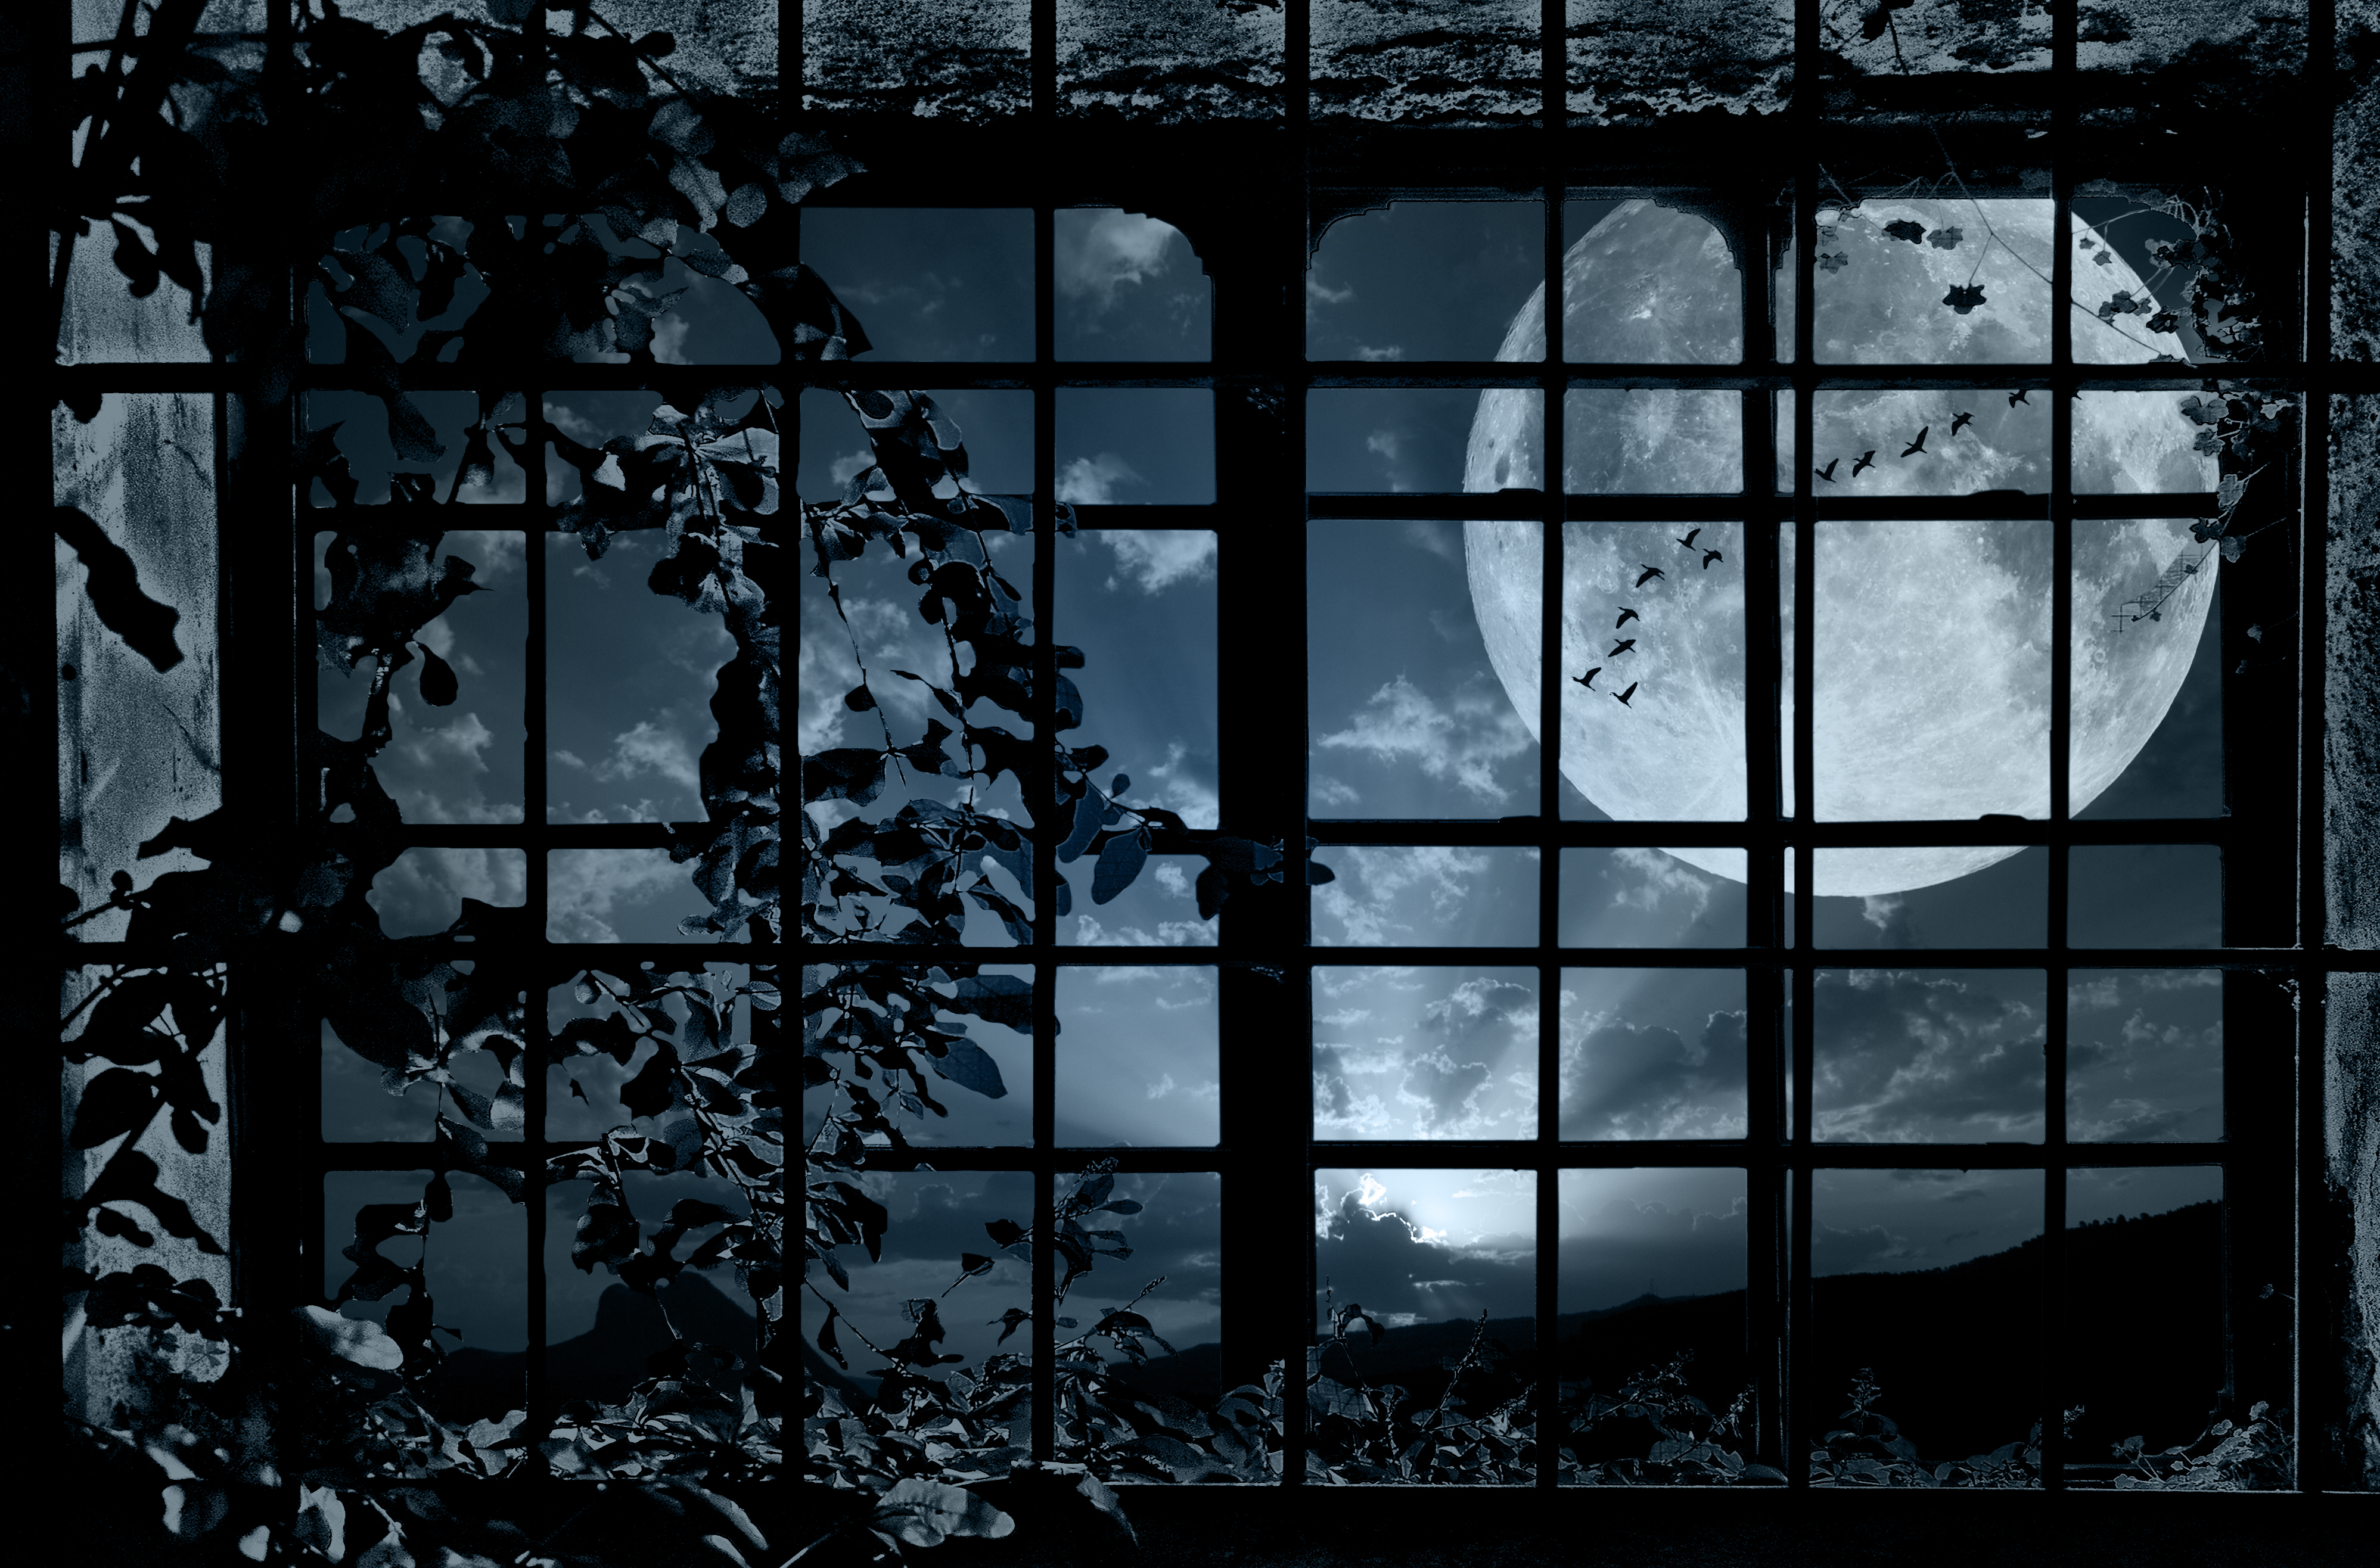 grille plant bindweed moon flock birds mood bokeh wallpaper background 3994x2632